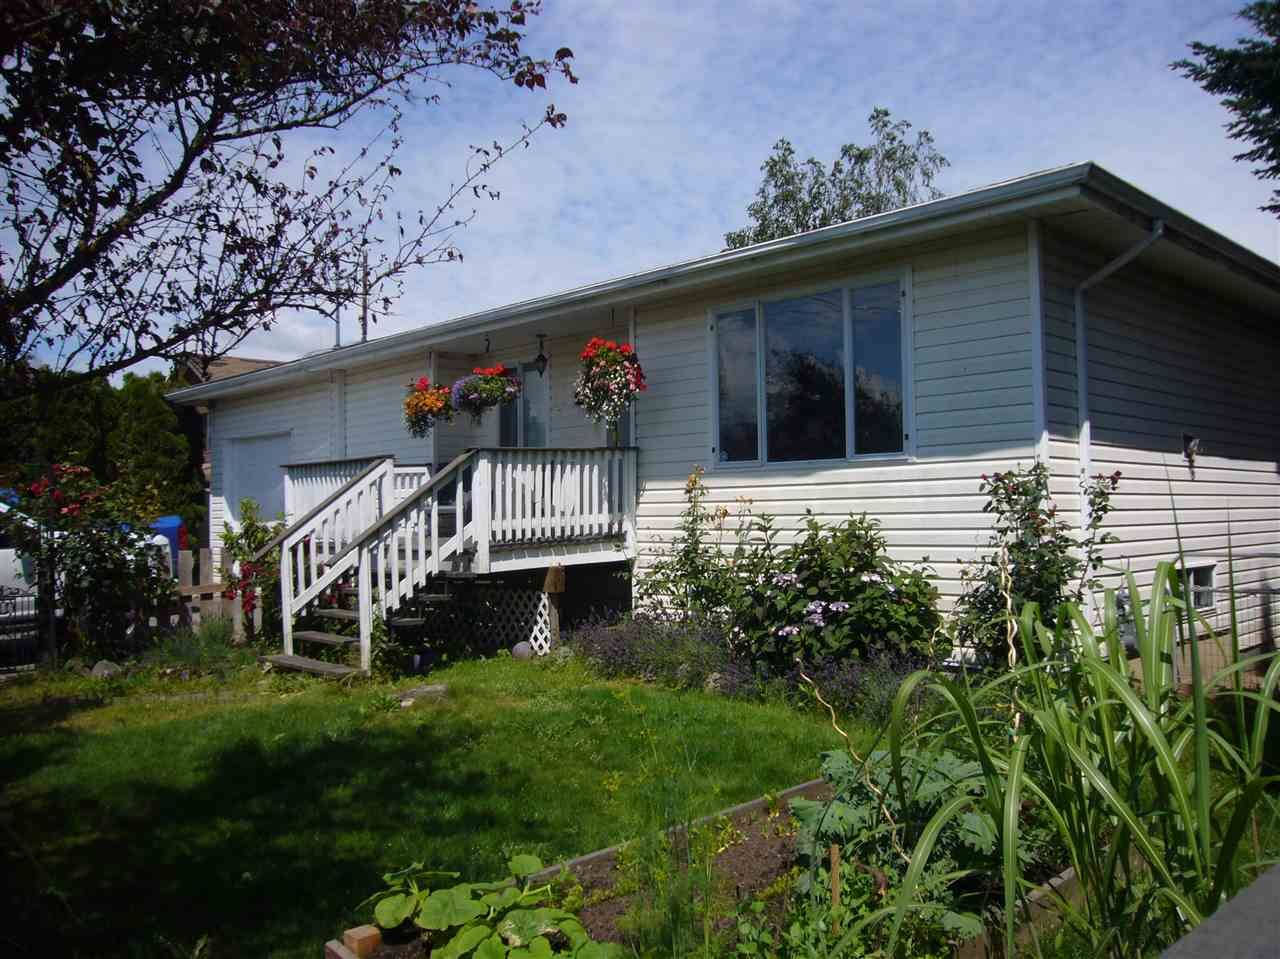 Main Photo: 6580 EVANS Road in Sardis: Sardis West Vedder Rd House for sale : MLS®# R2085581